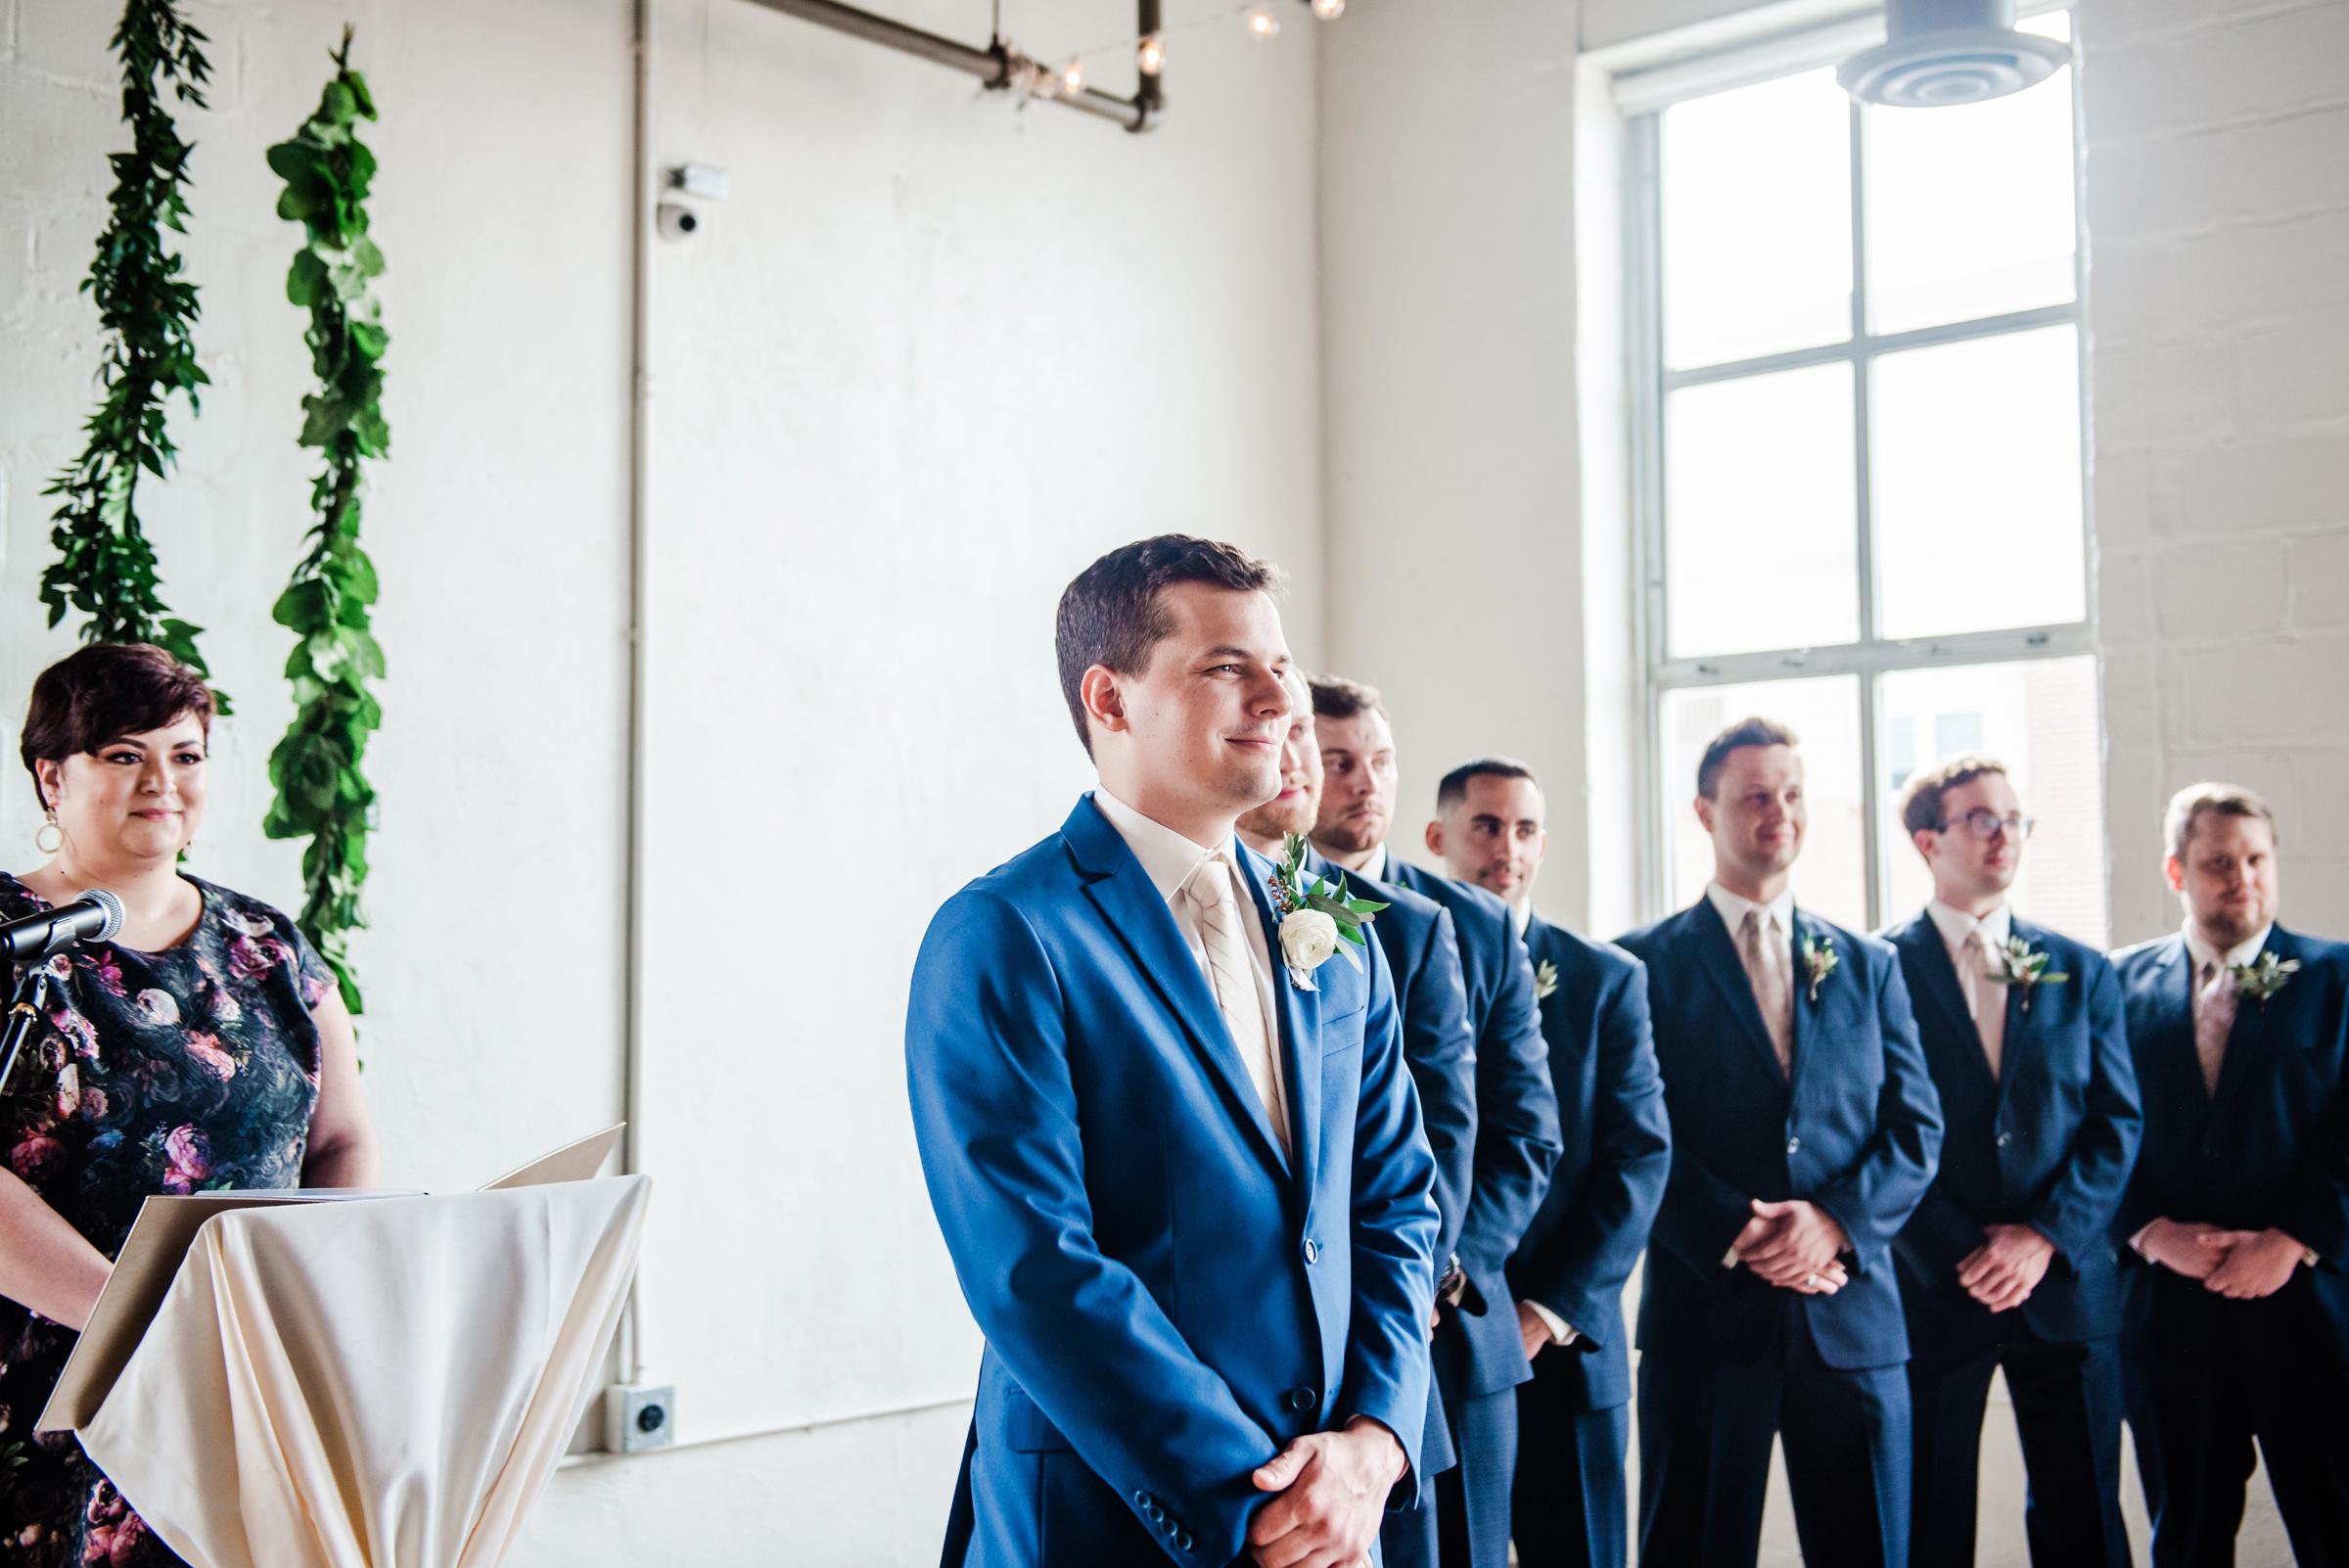 The_Arbor_LoftRochester_Wedding_JILL_STUDIO_Rochester_NY_Photographer_170444.jpg